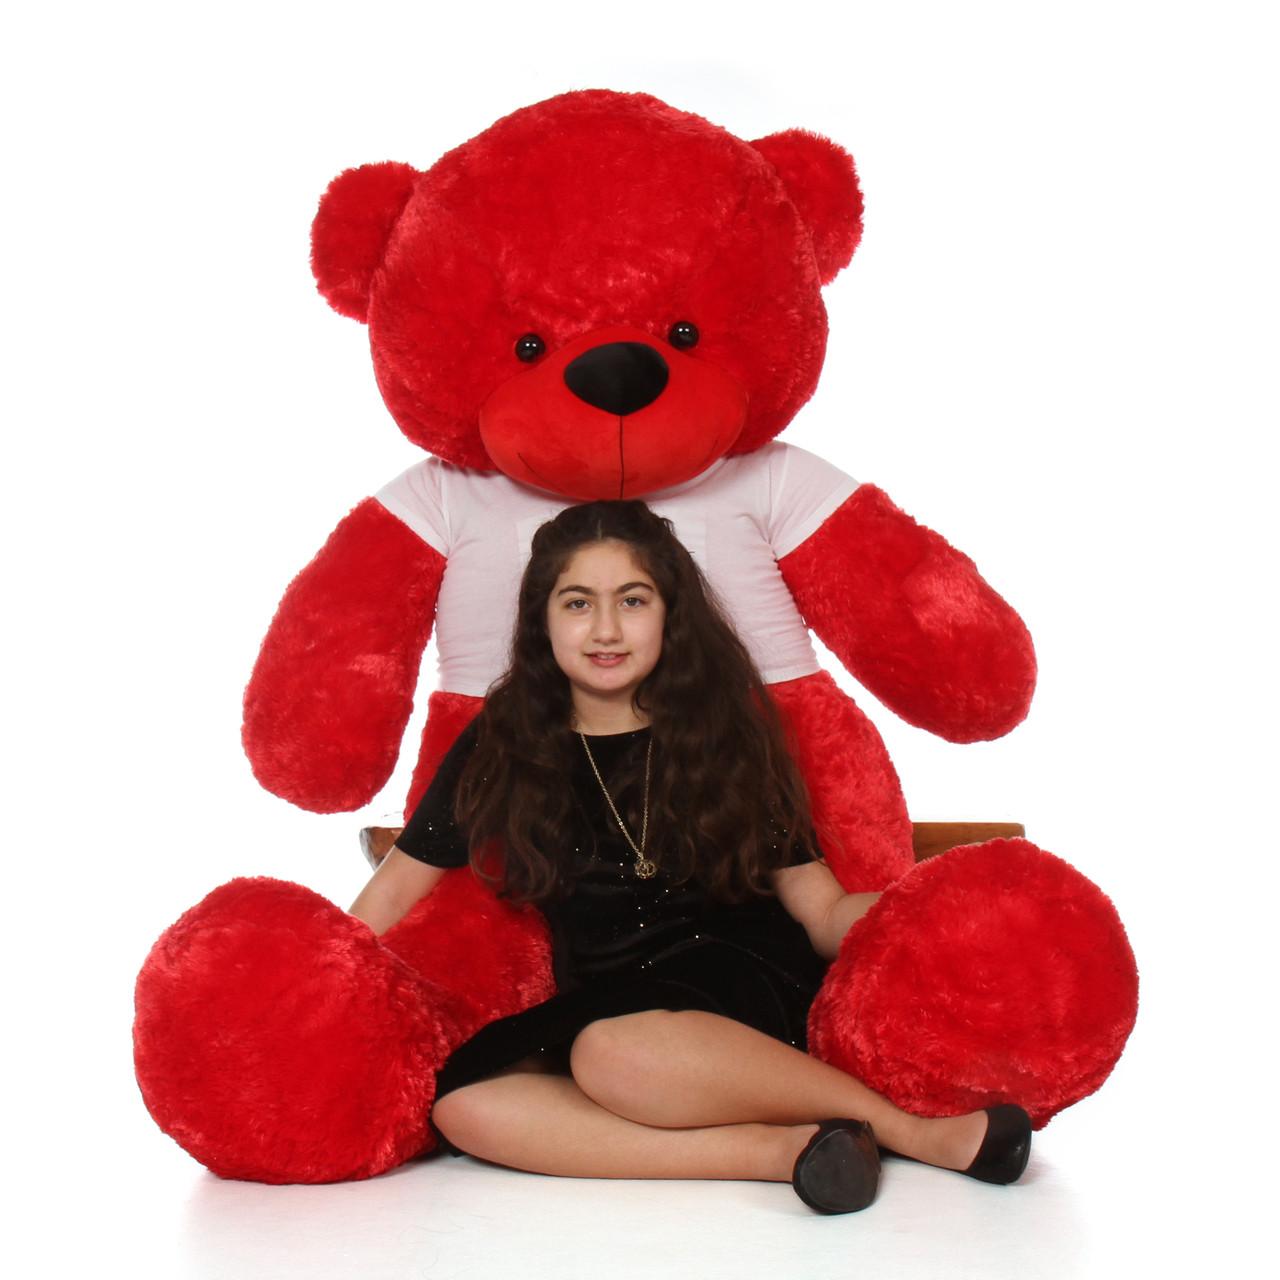 Valentine's Day Gift Teddy Bear - 6 Foot Red Giant Teddy Bear